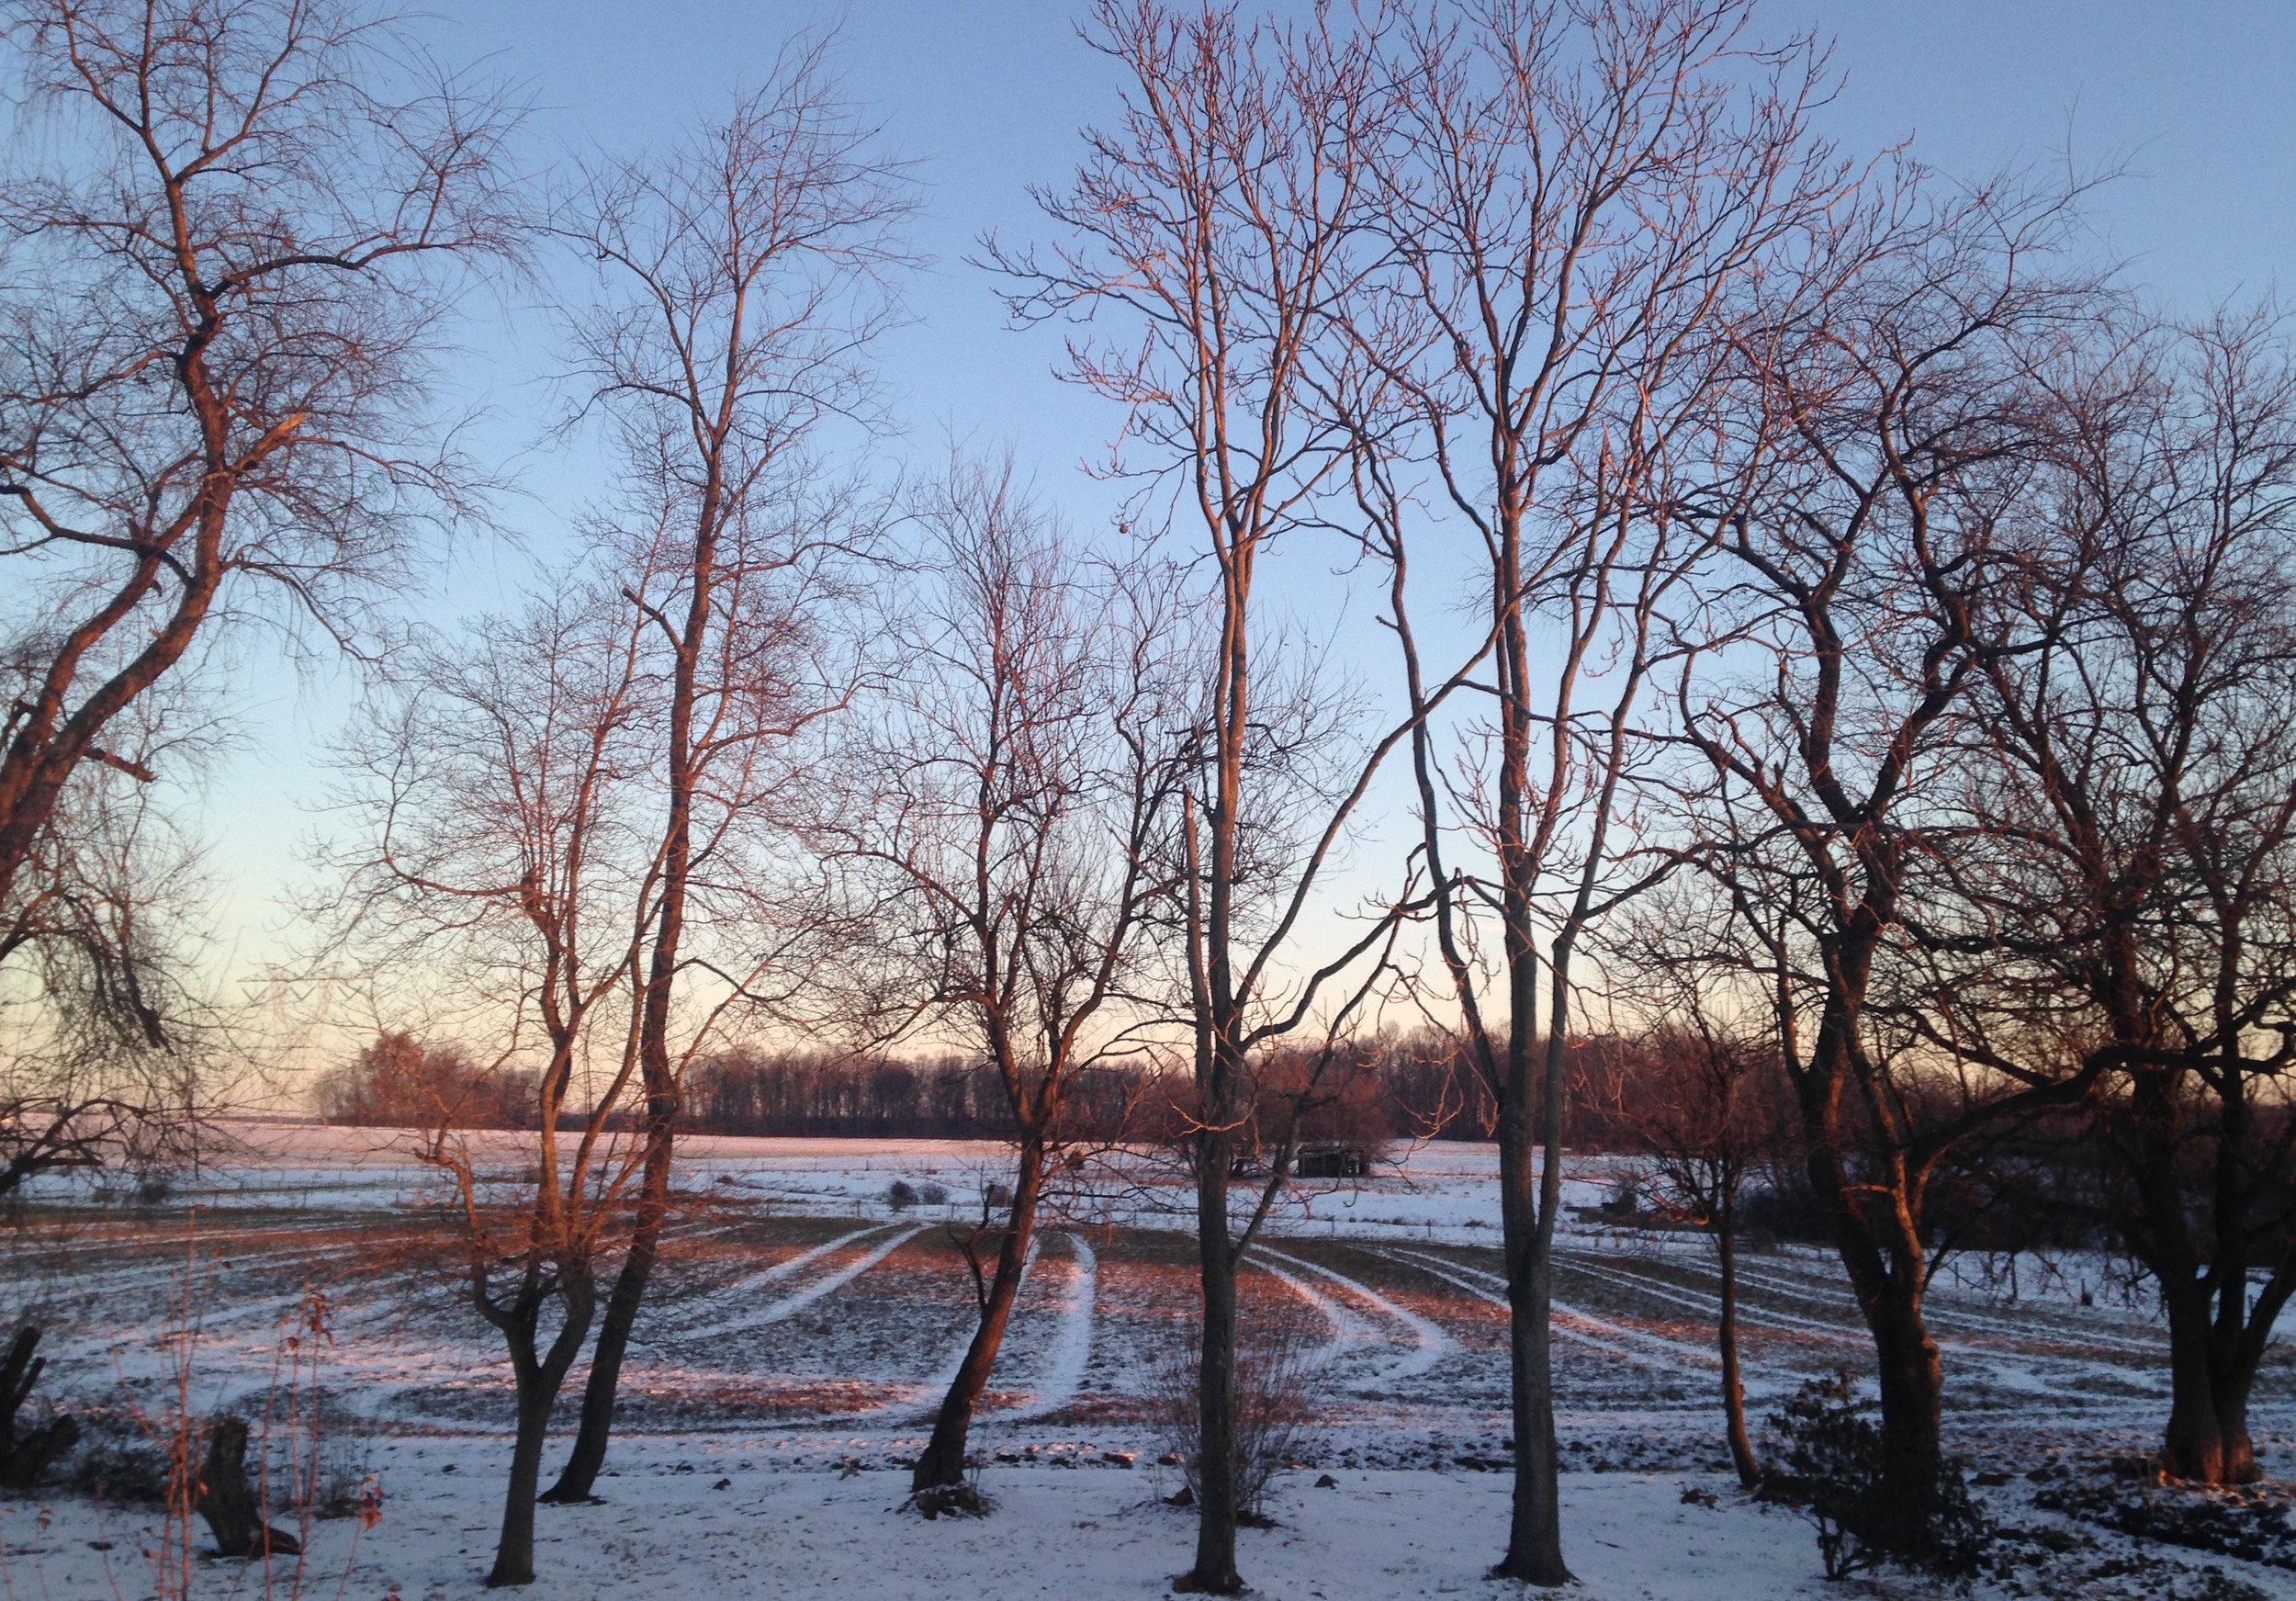 sunrise, moonset ... new year's clarity - by gina loree marks 1/2/18